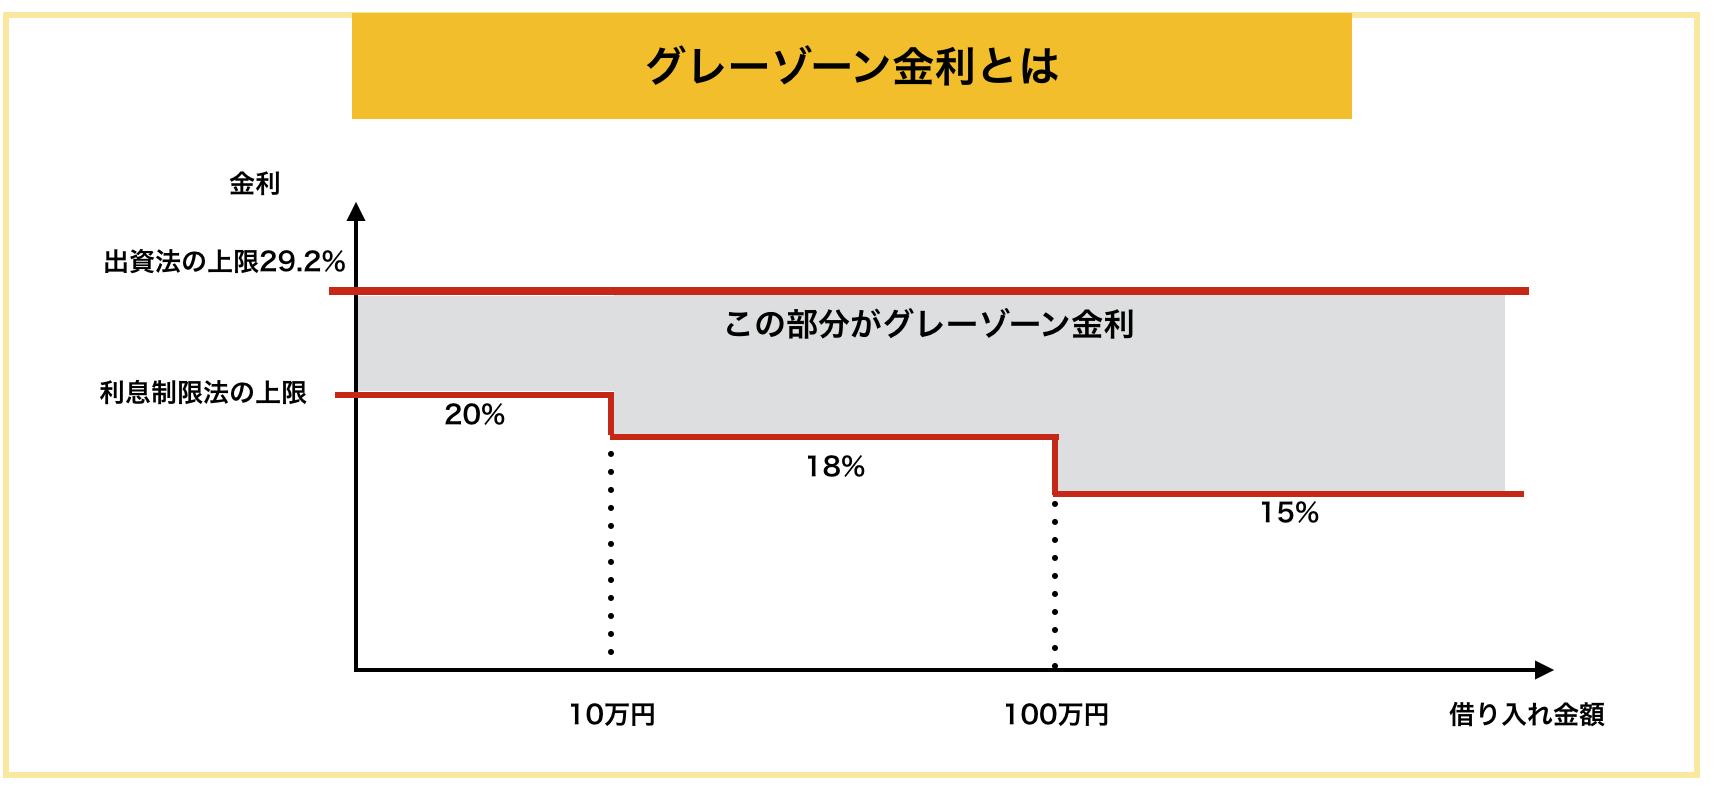 %e3%82%b9%e3%82%af%e3%83%aa%e3%83%bc%e3%83%b3%e3%82%b7%e3%83%a7%e3%83%83%e3%83%88-2016-09-28-17-50-46